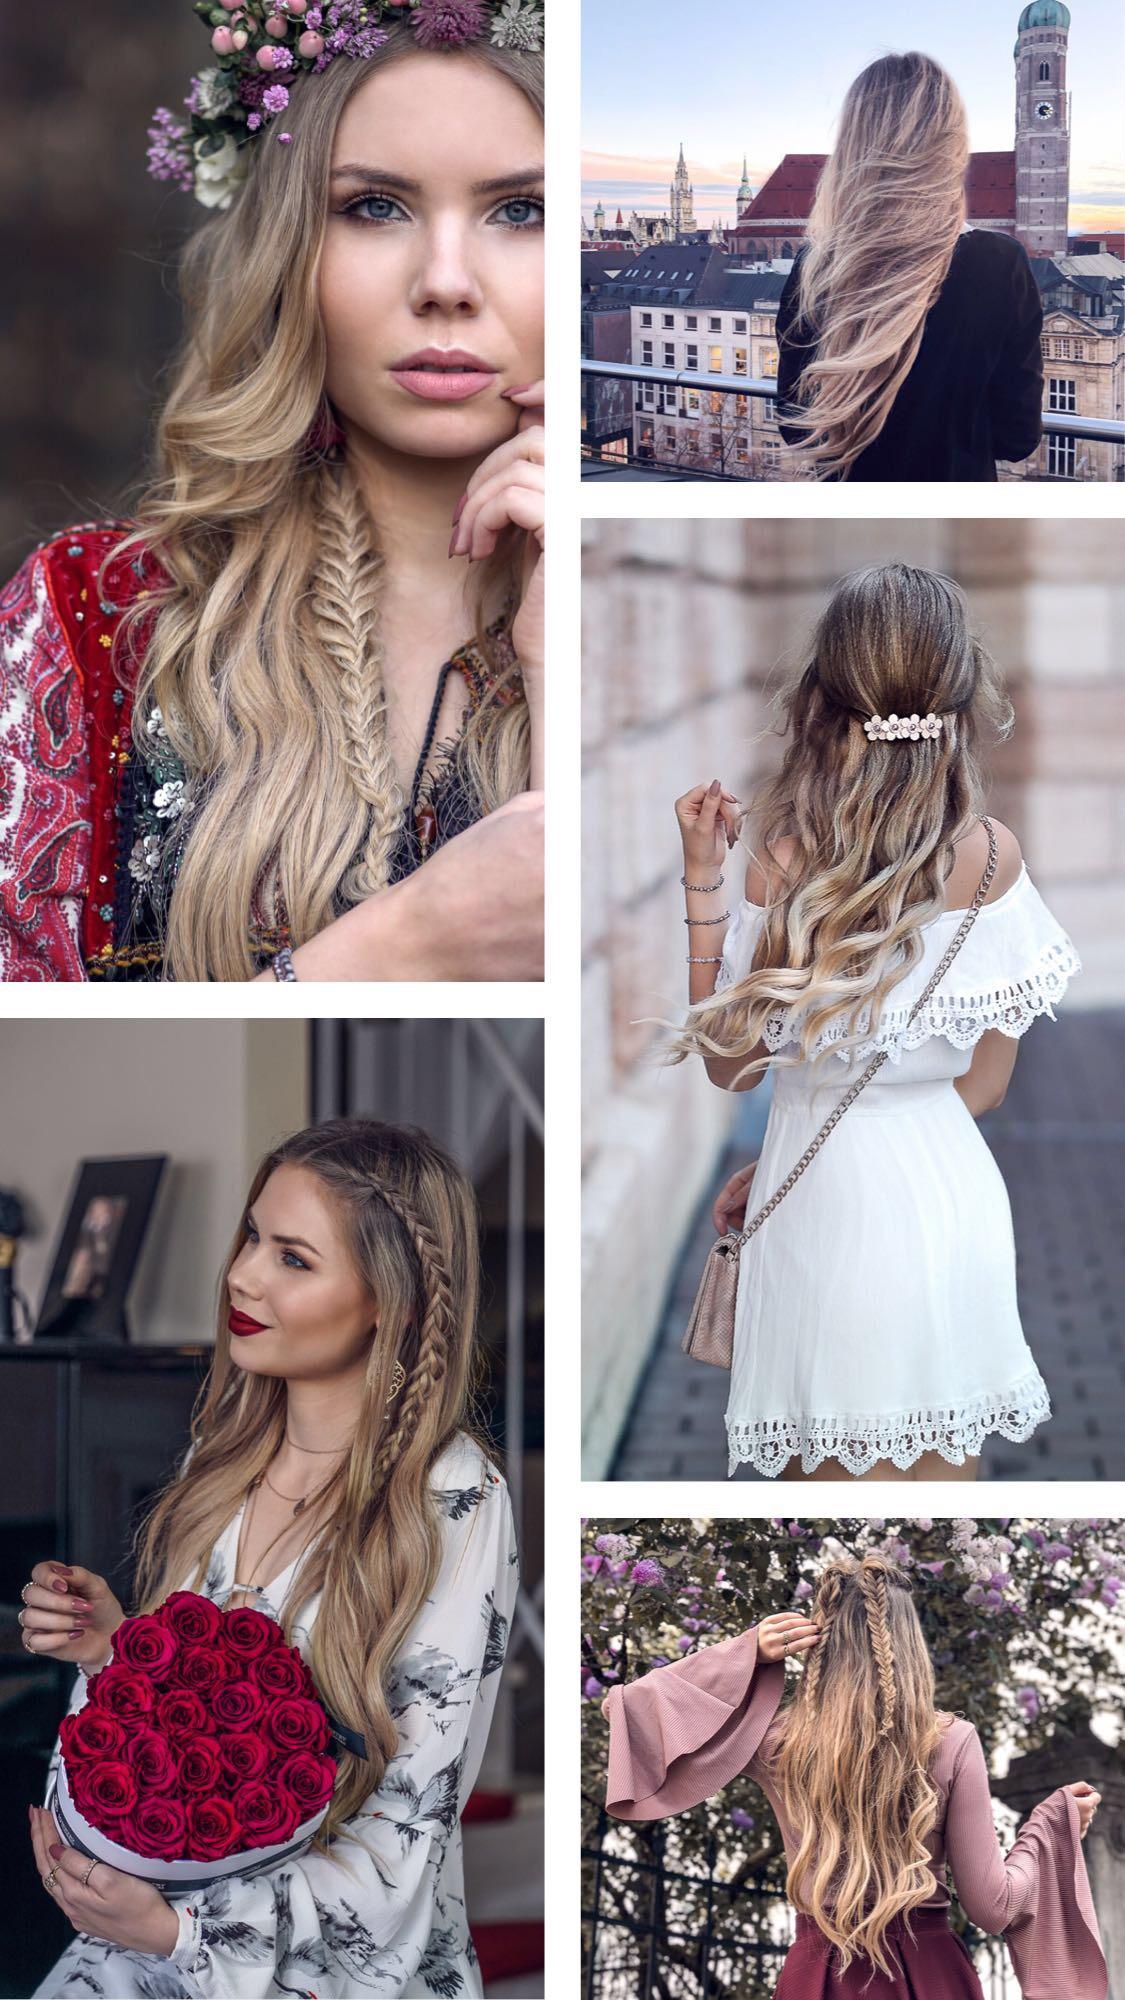 Haar Inspiration Bilder - Instagram therubinrose